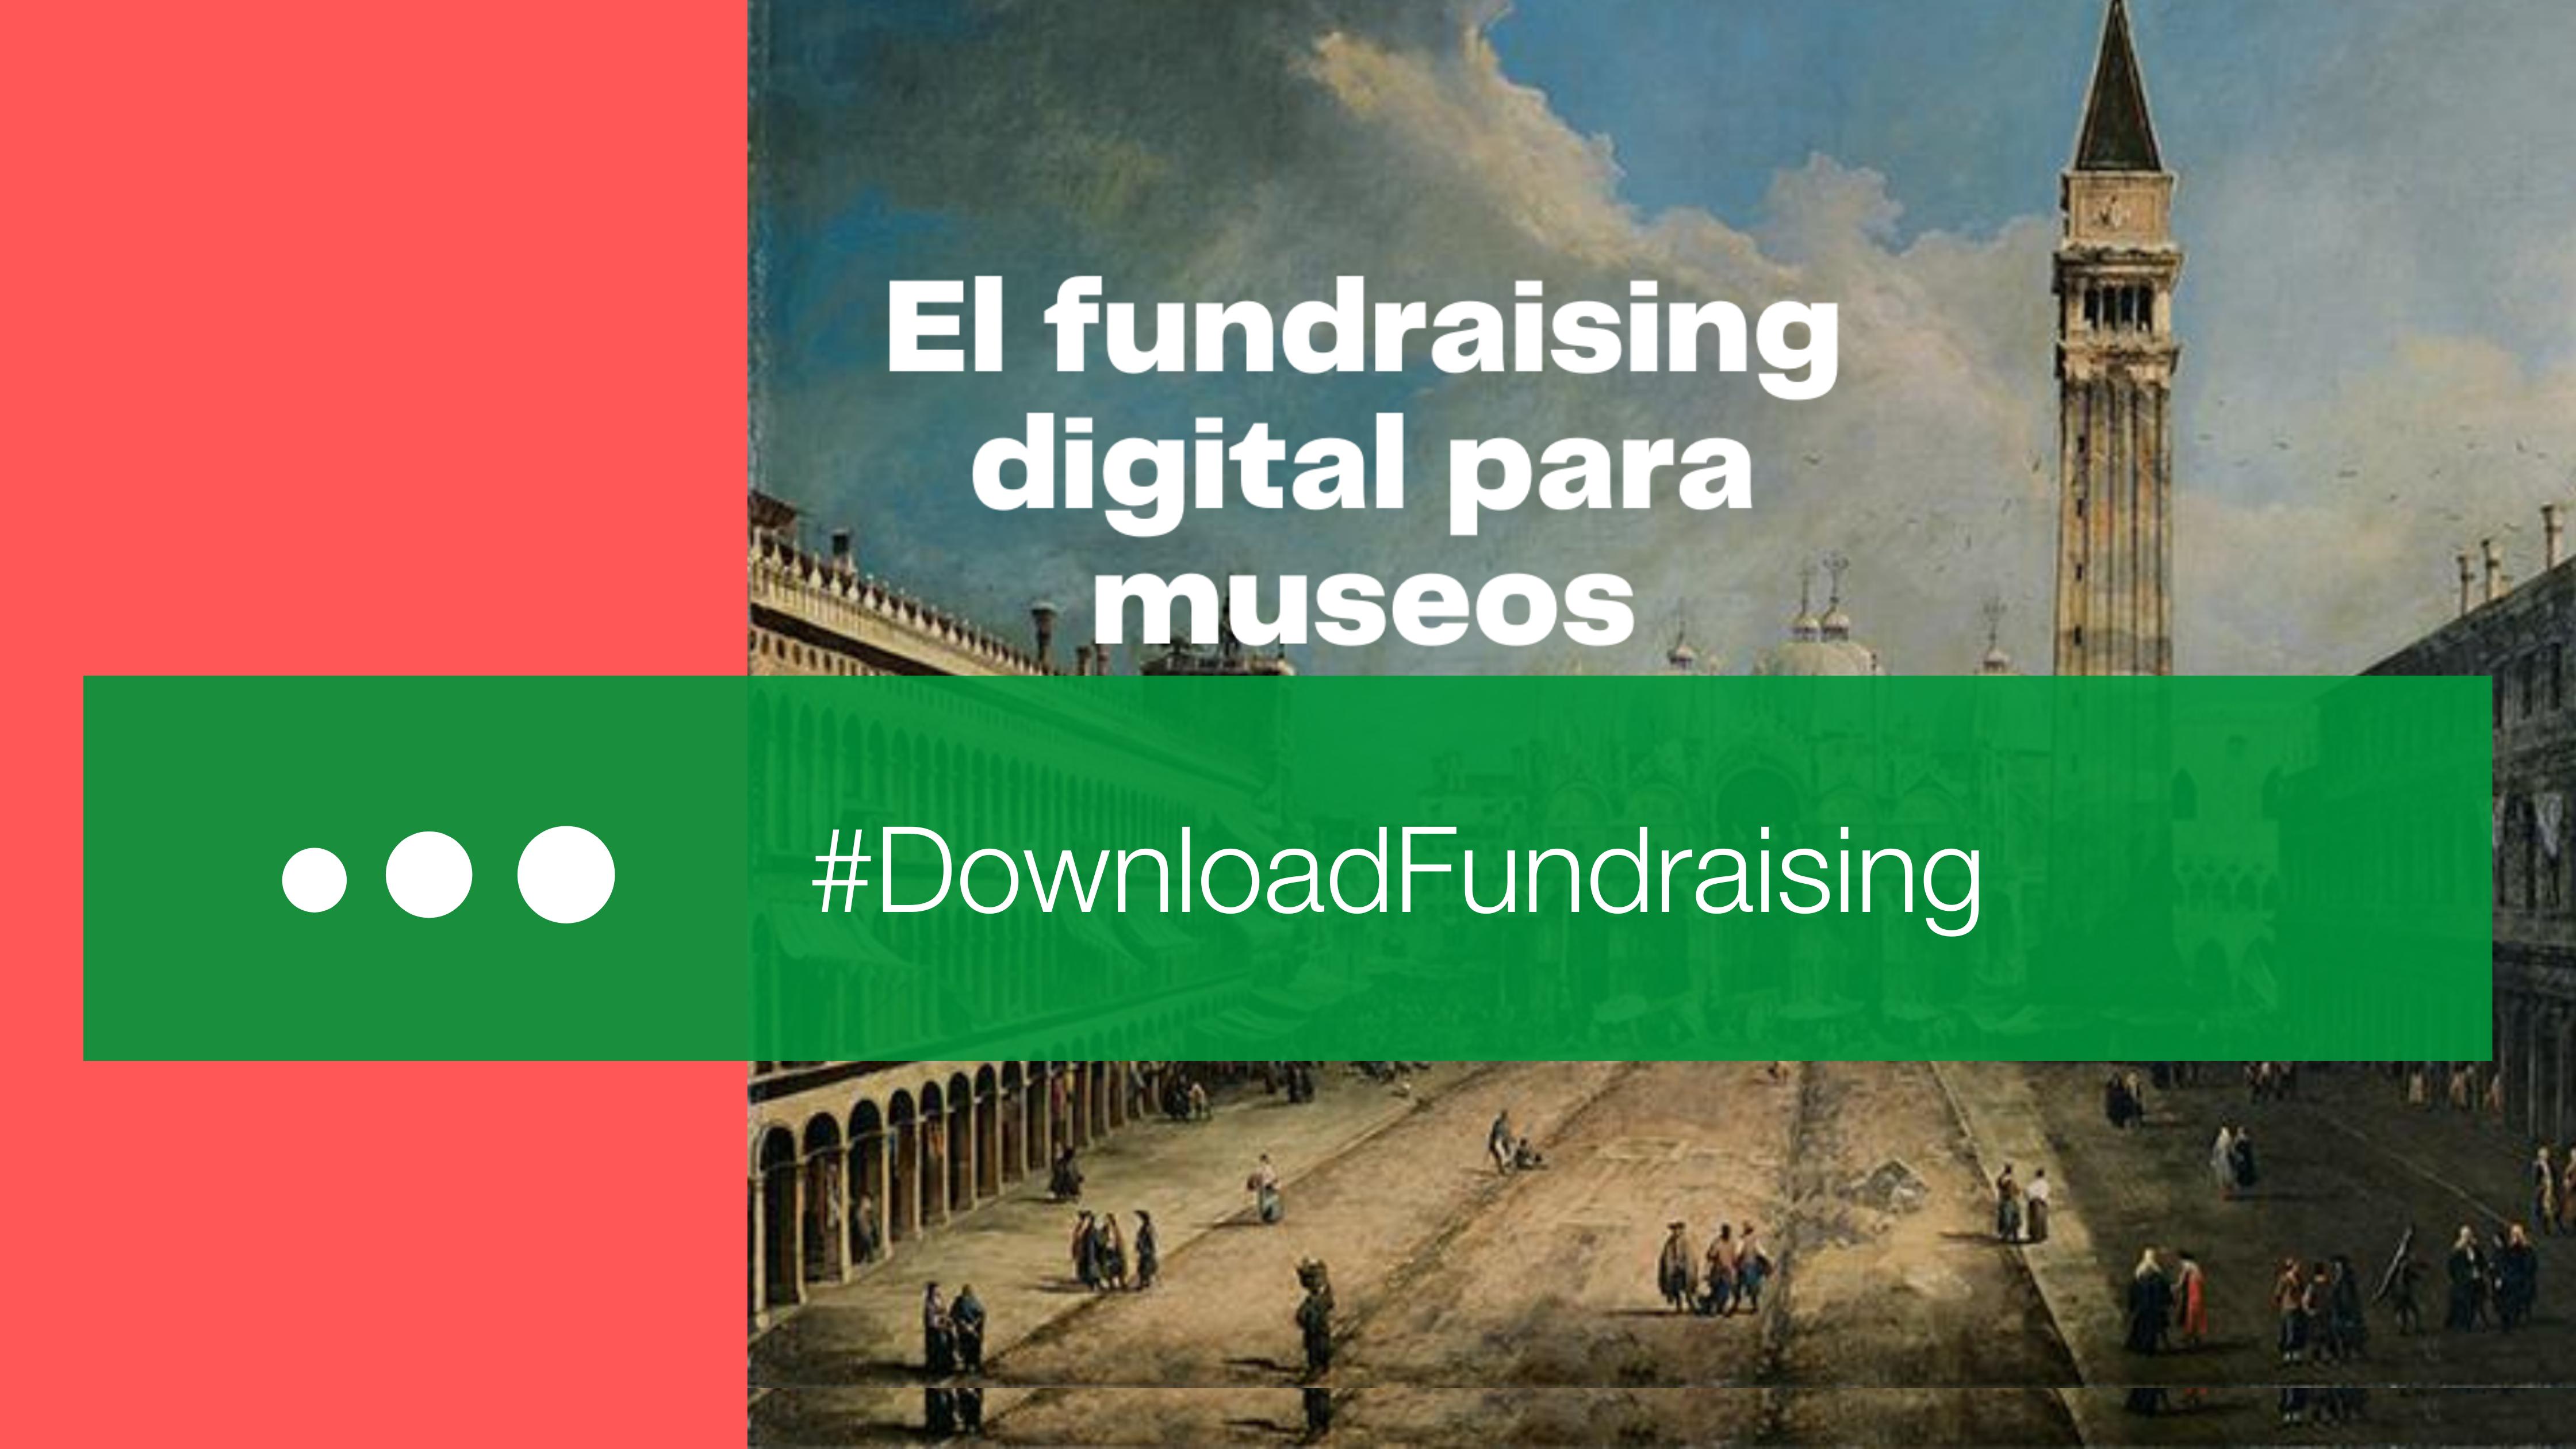 Especial Museos: ideas creativas para captar fondos digitalmente [eBook]